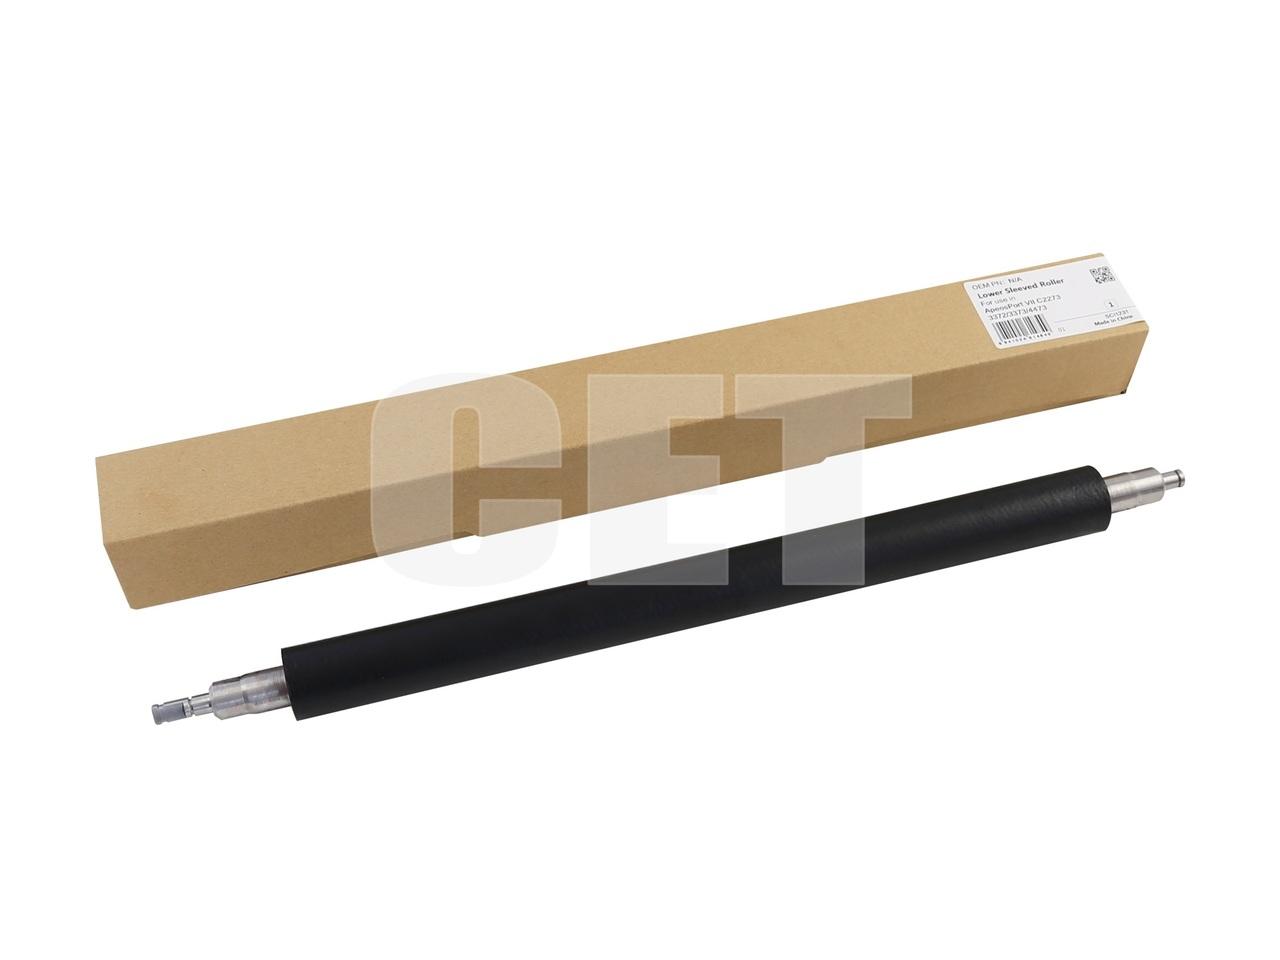 Резиновый вал для XEROX VersaLink C8000/9000 (CET),CET211019